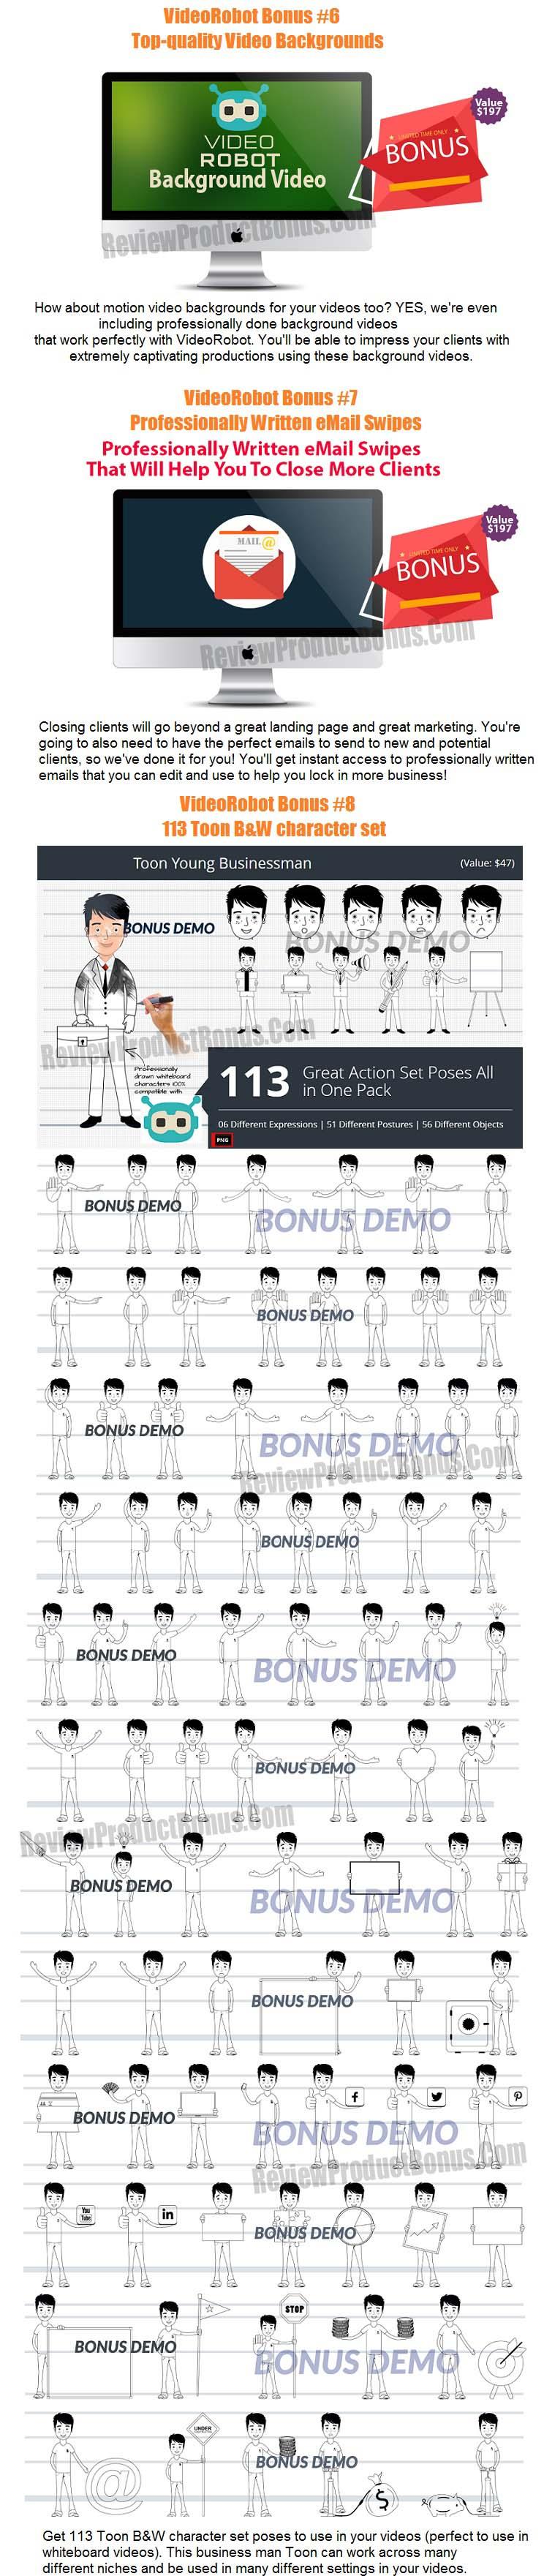 VideoRobot Bonuses